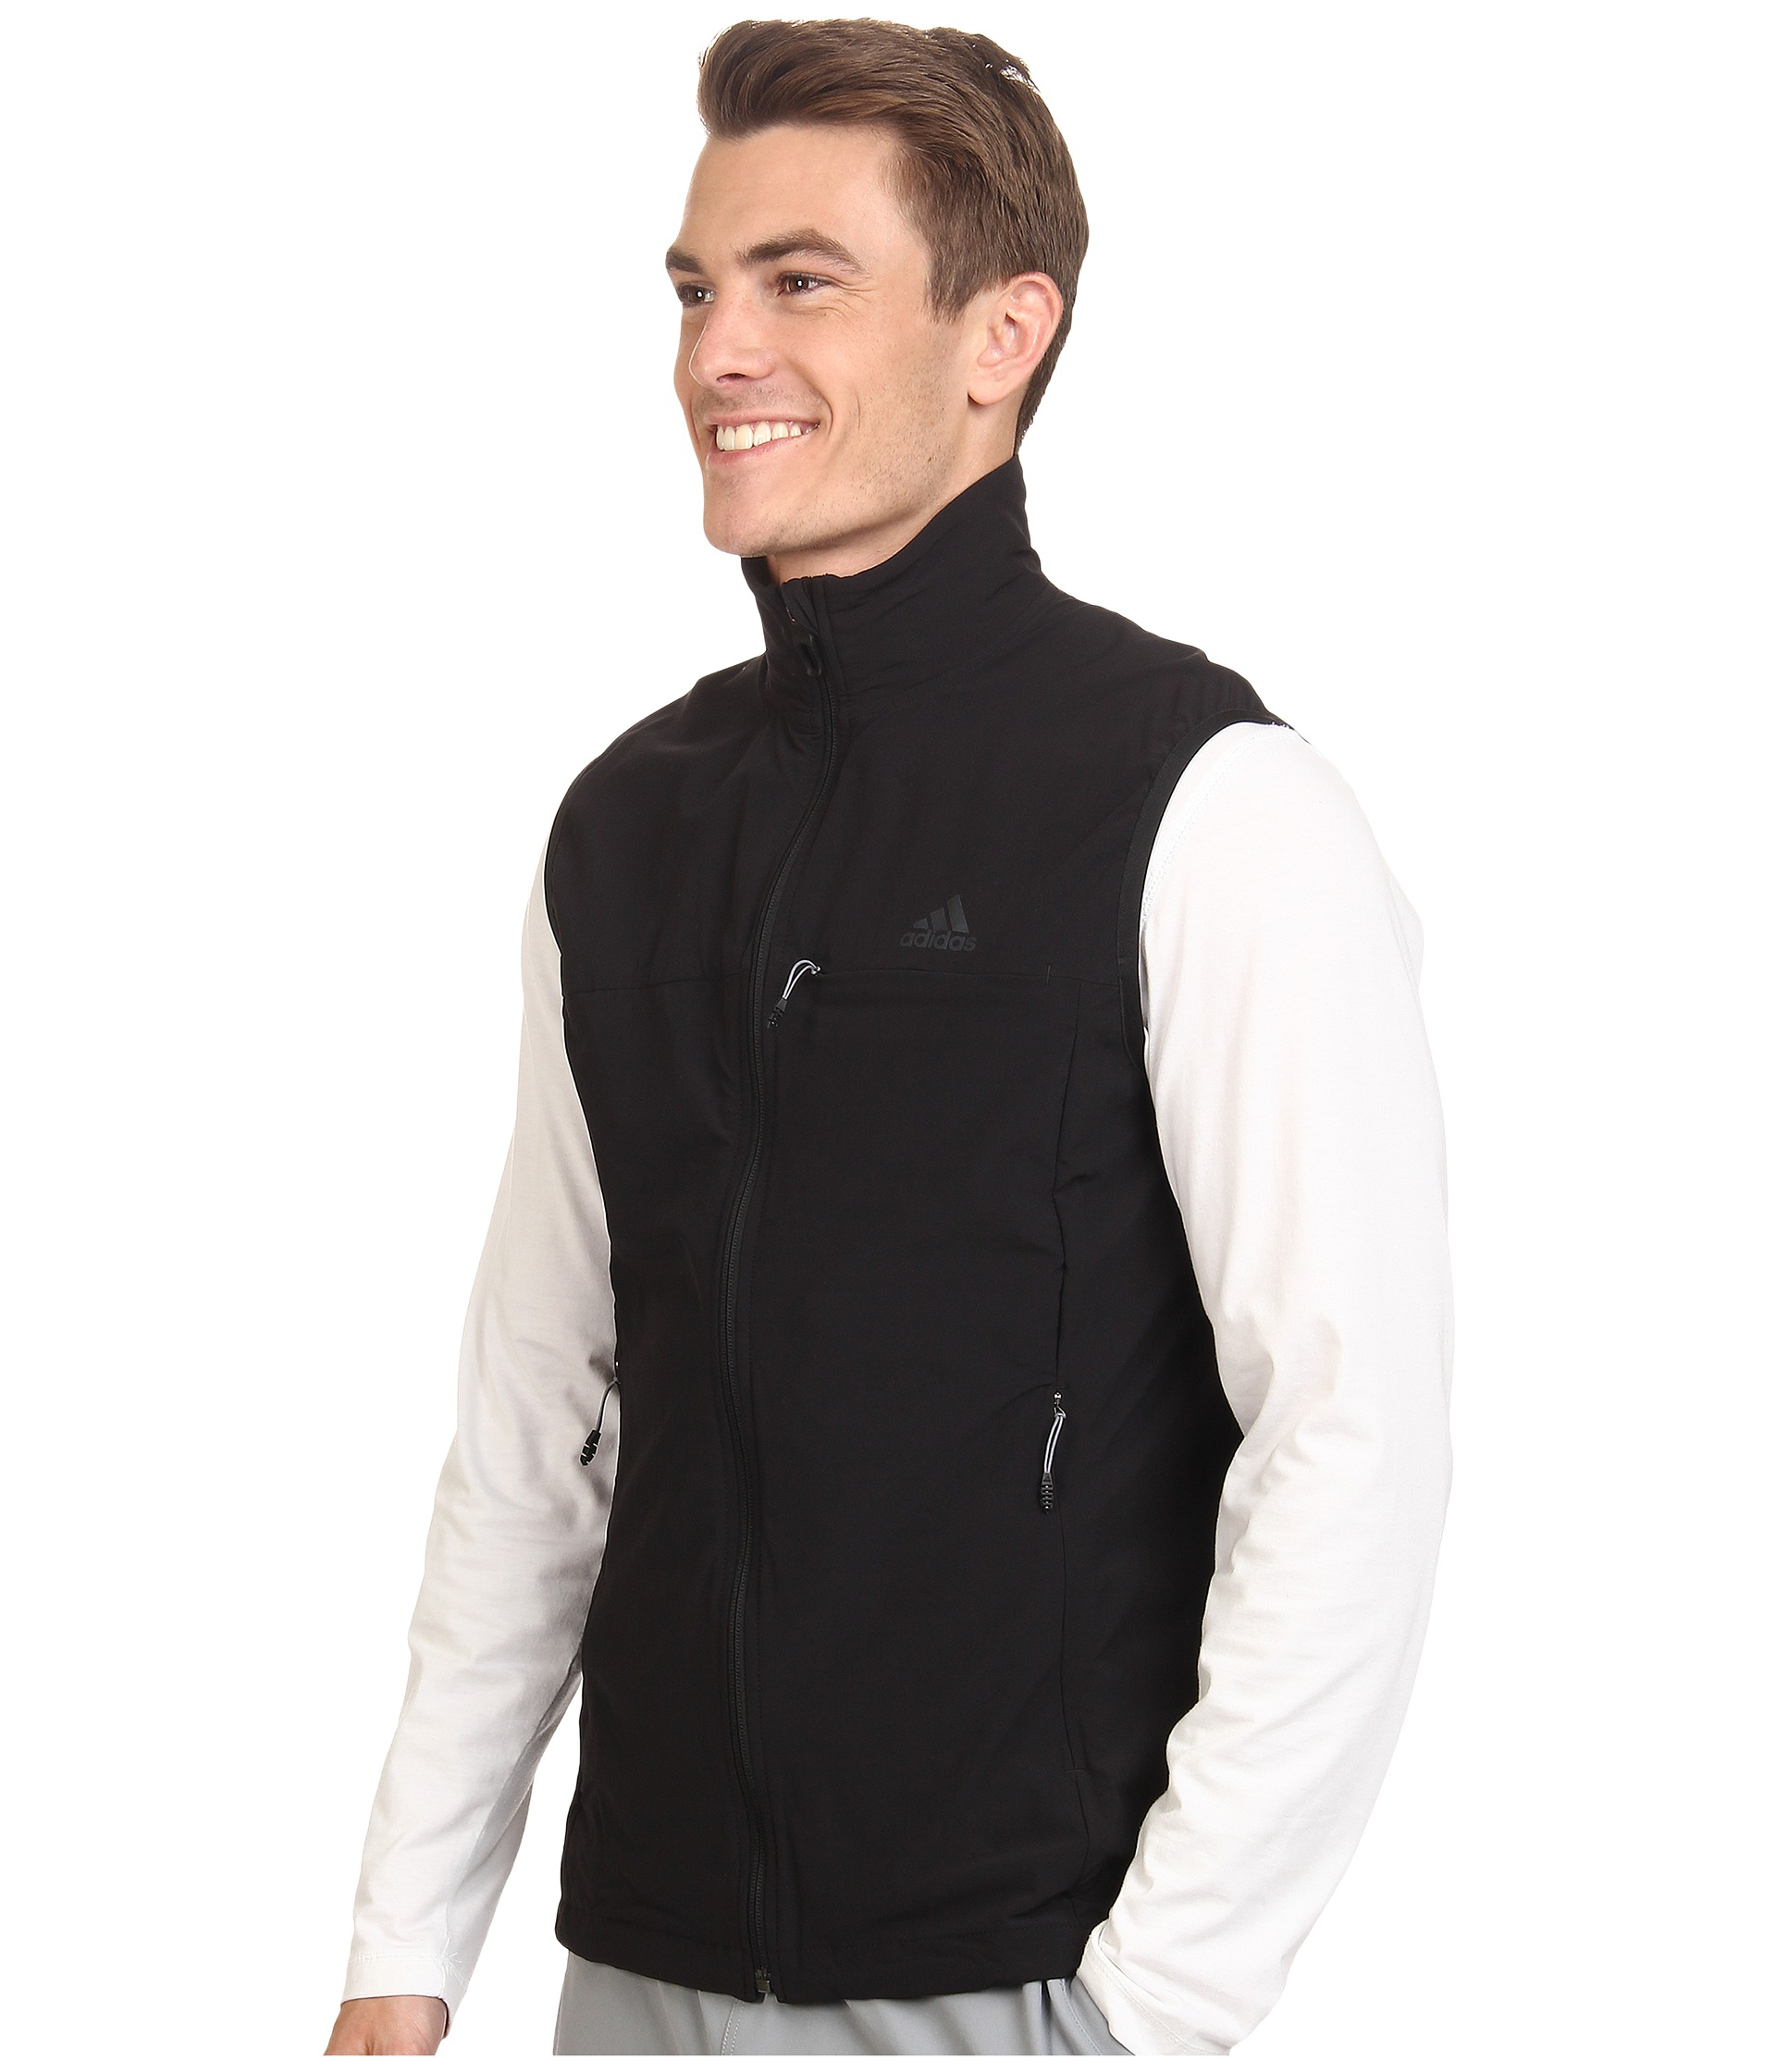 94f357c322d1 Lyst - adidas Terrex Swift Softshell Vest in Black for Men